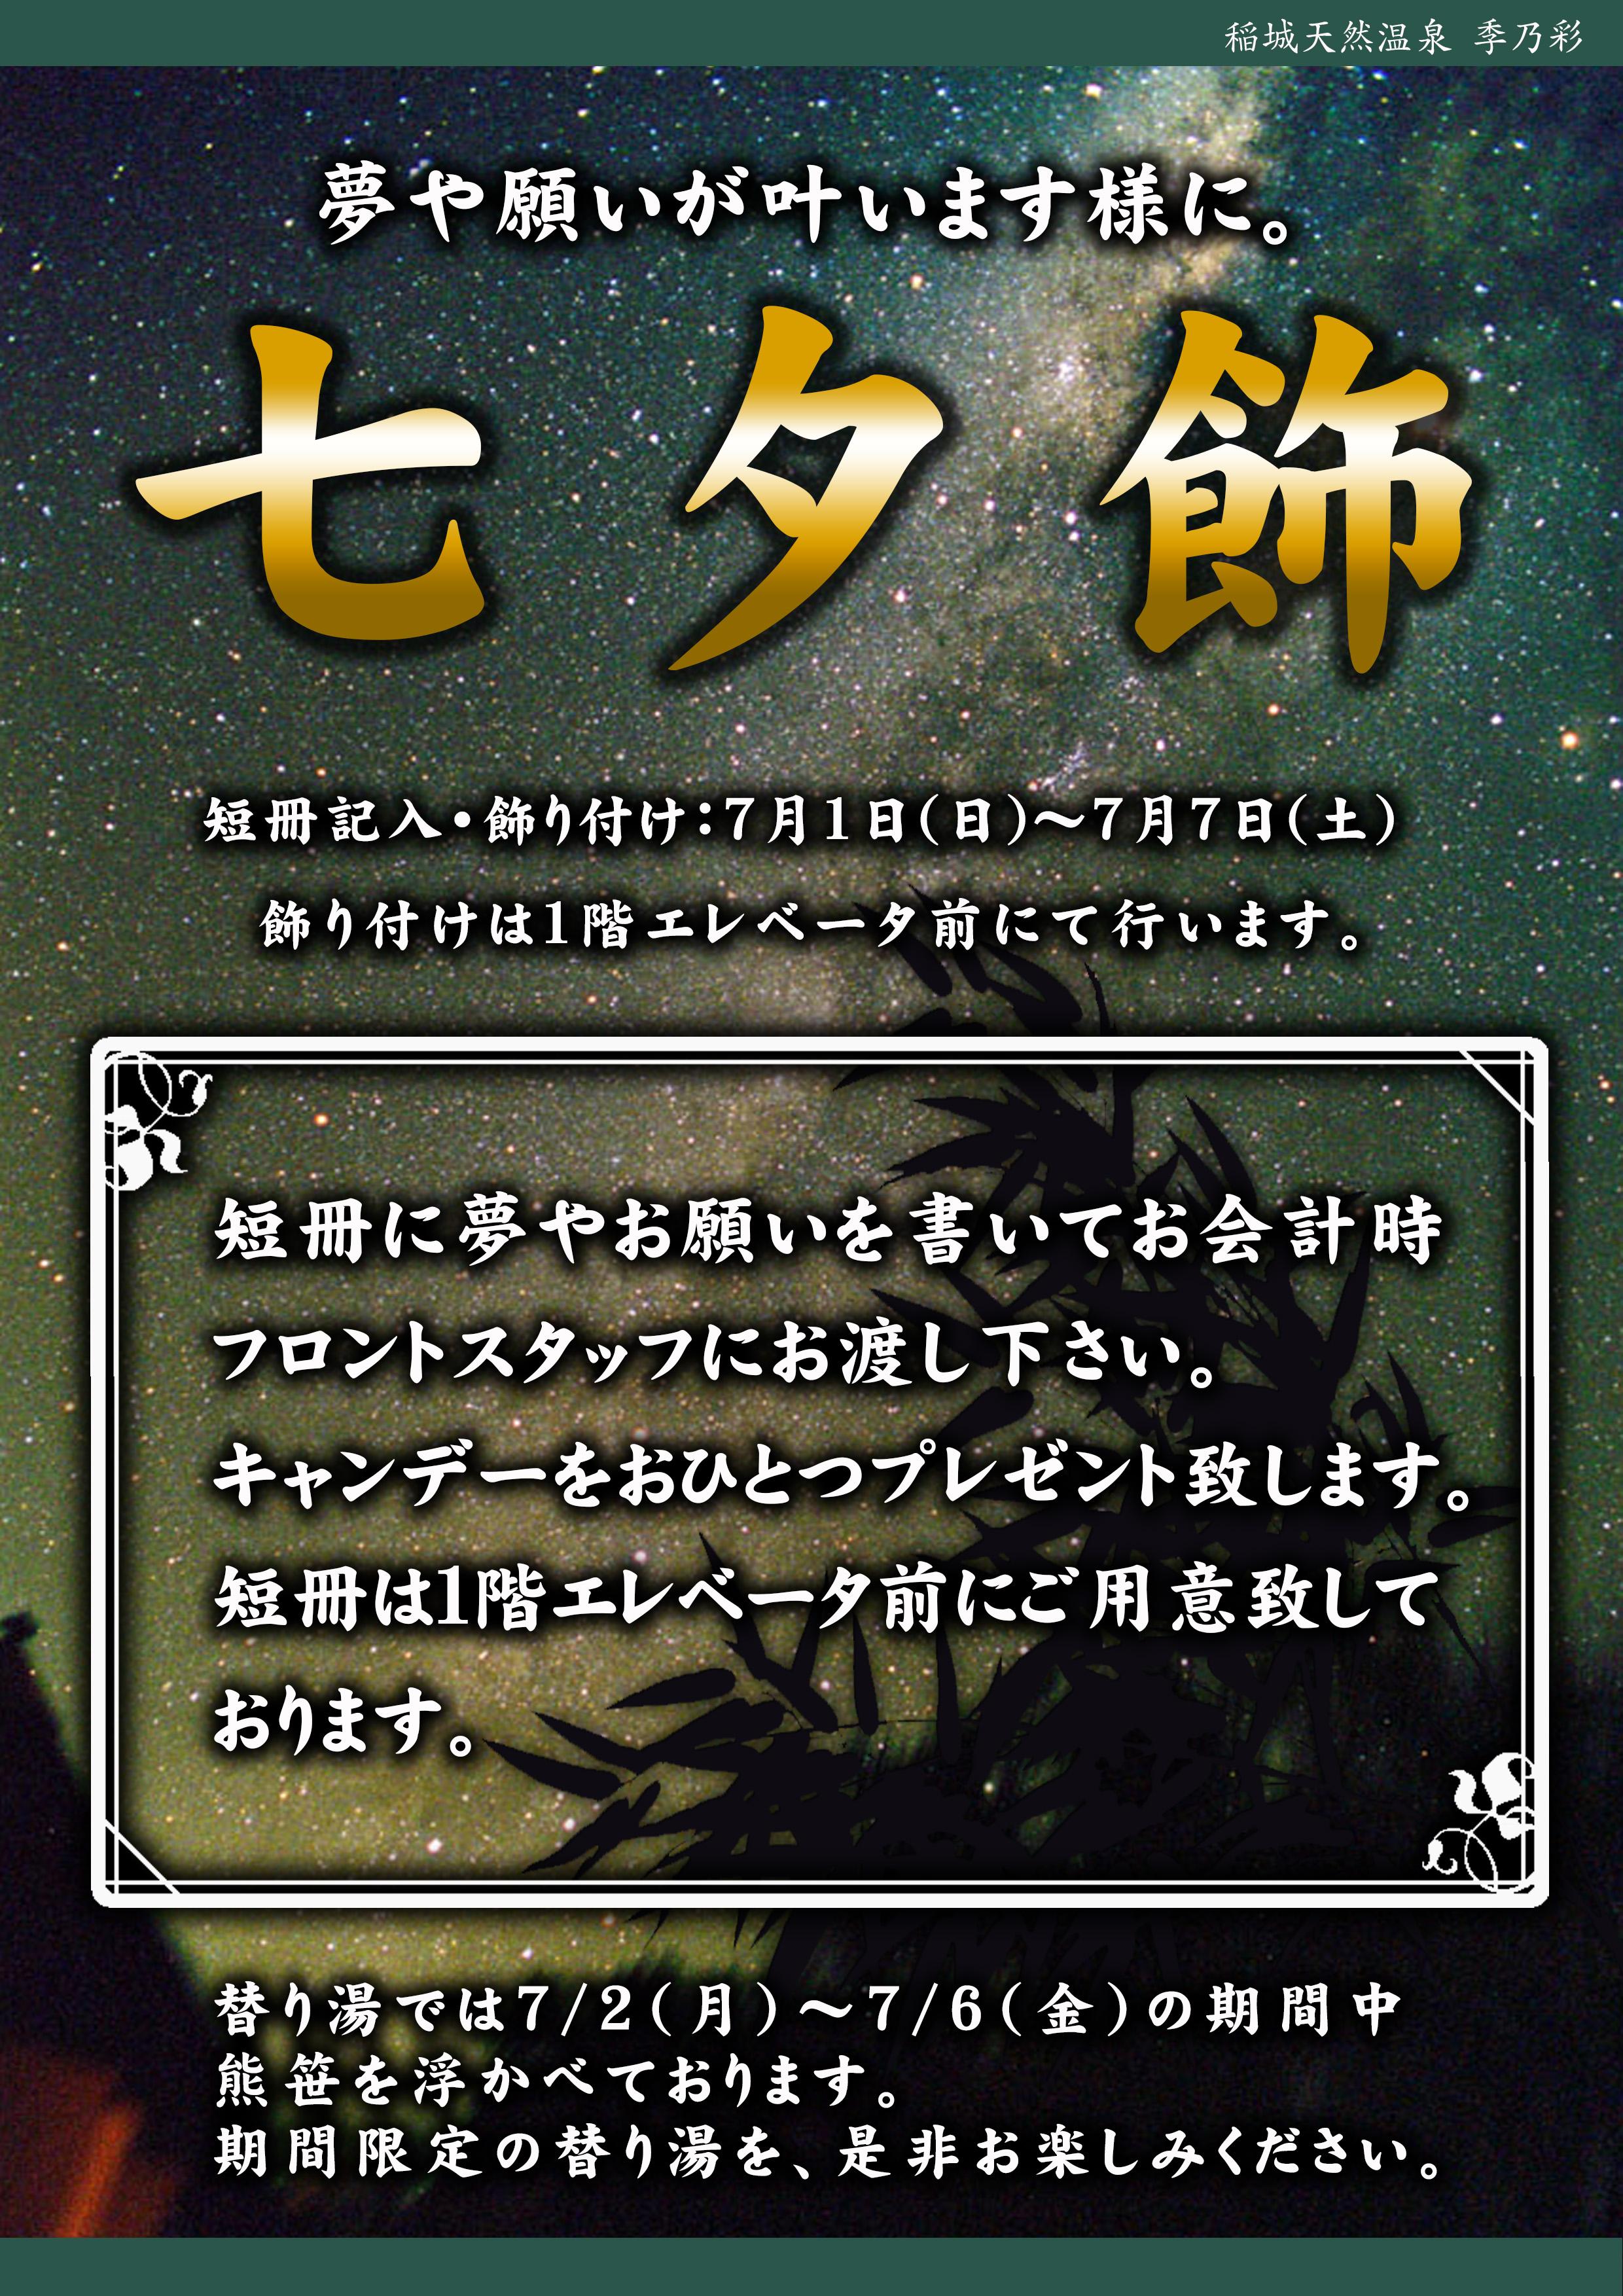 20180701POP イベント 7月 七夕飾り